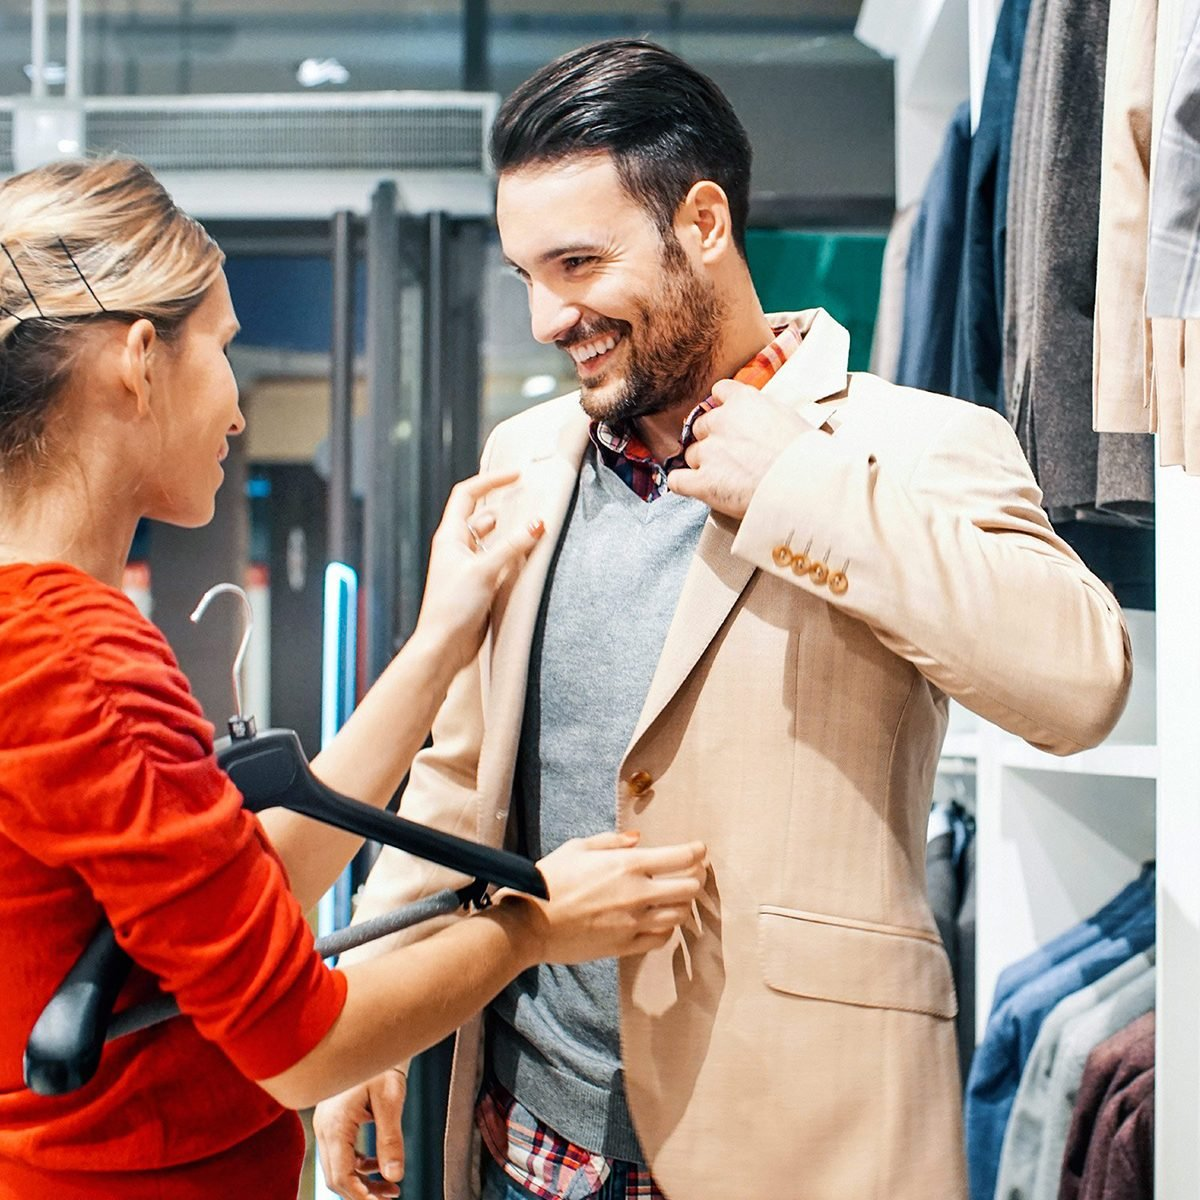 Woman helping man put on a blazer